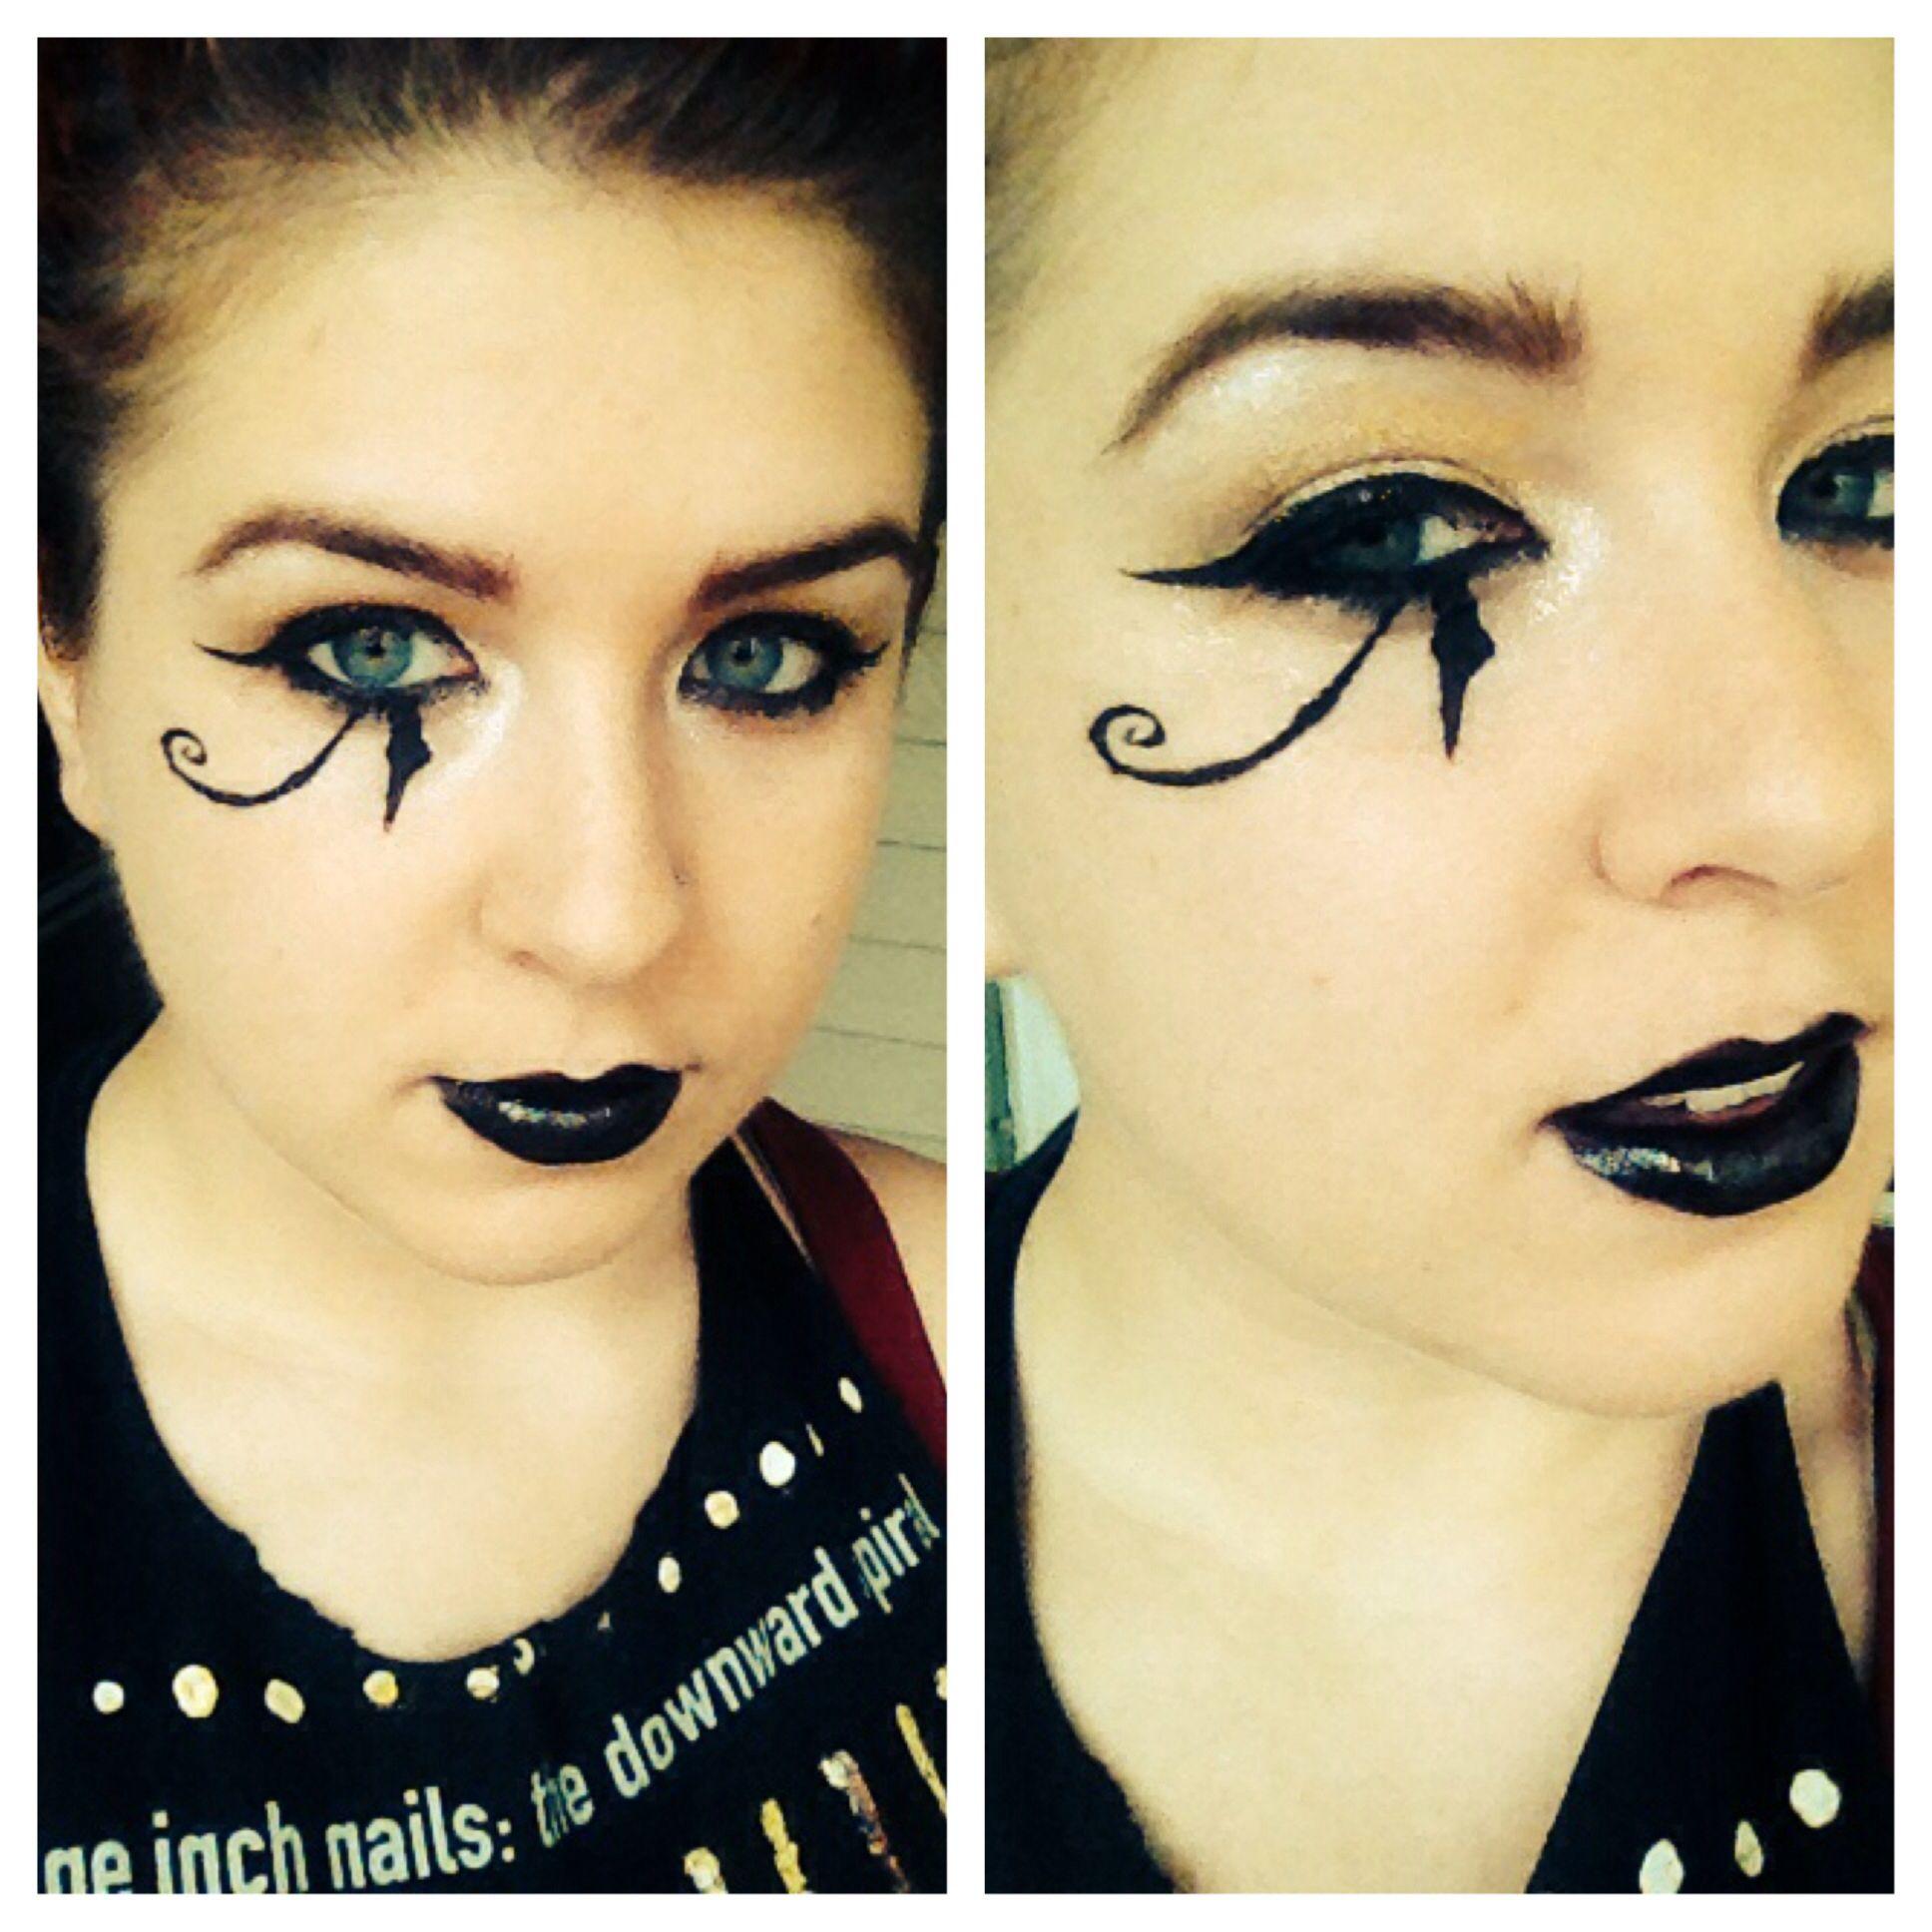 Eye of Horus makeup//Darcy Vendetta The eye Pinterest